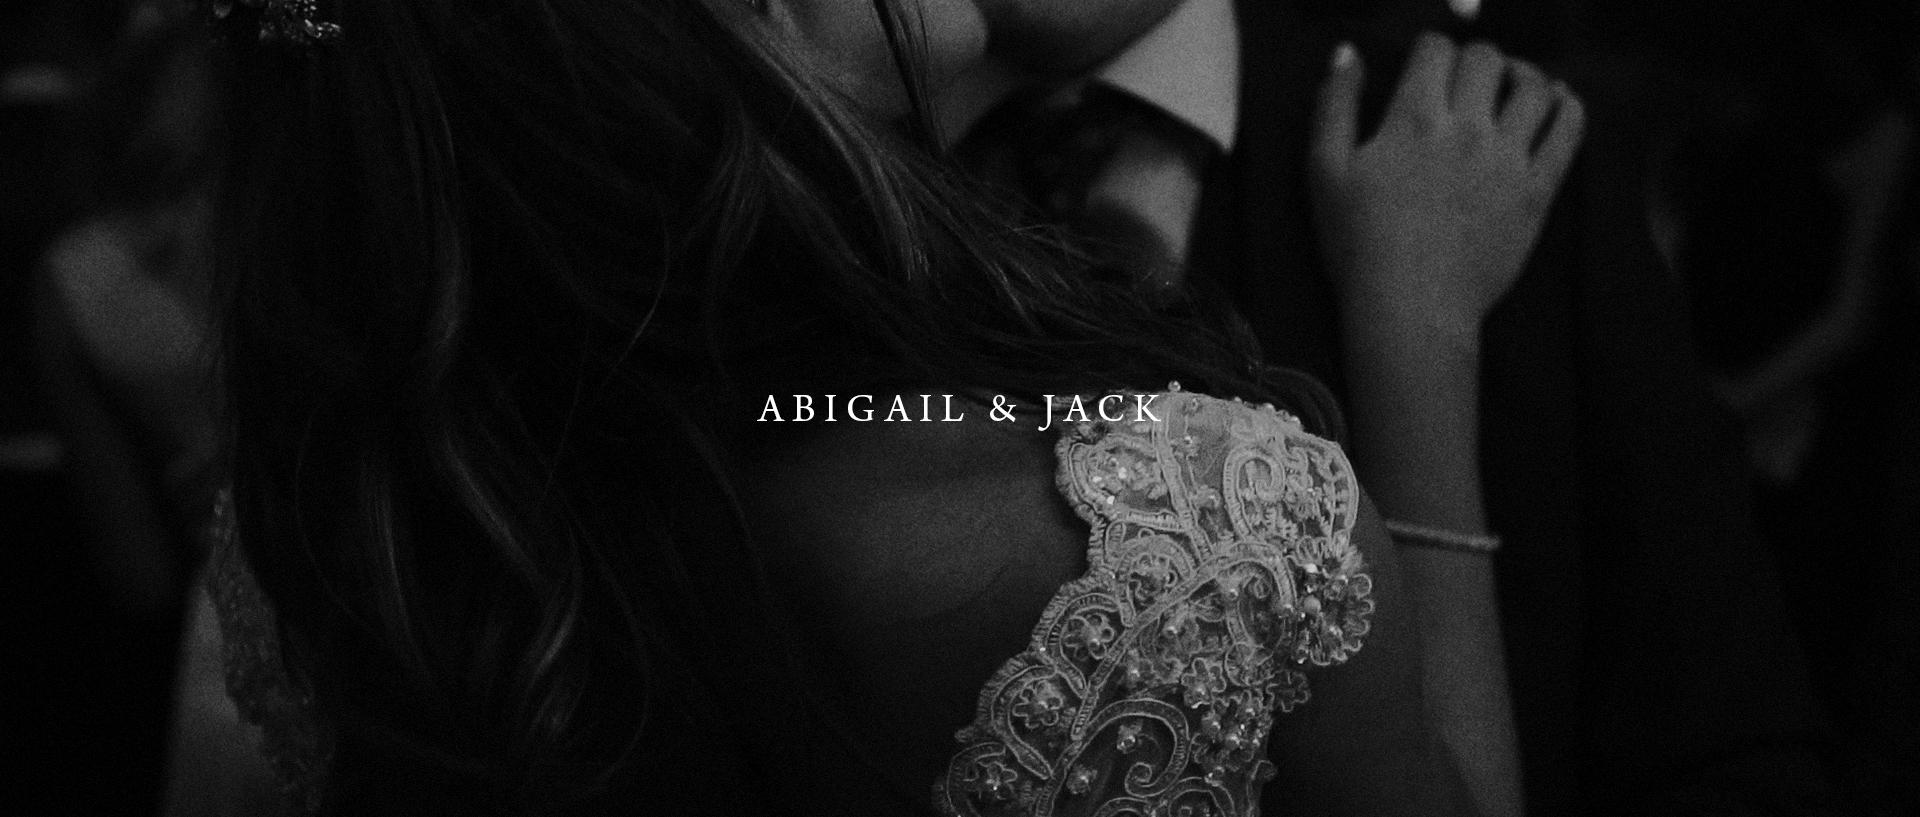 abigailjack-1-thumbnail.jpg